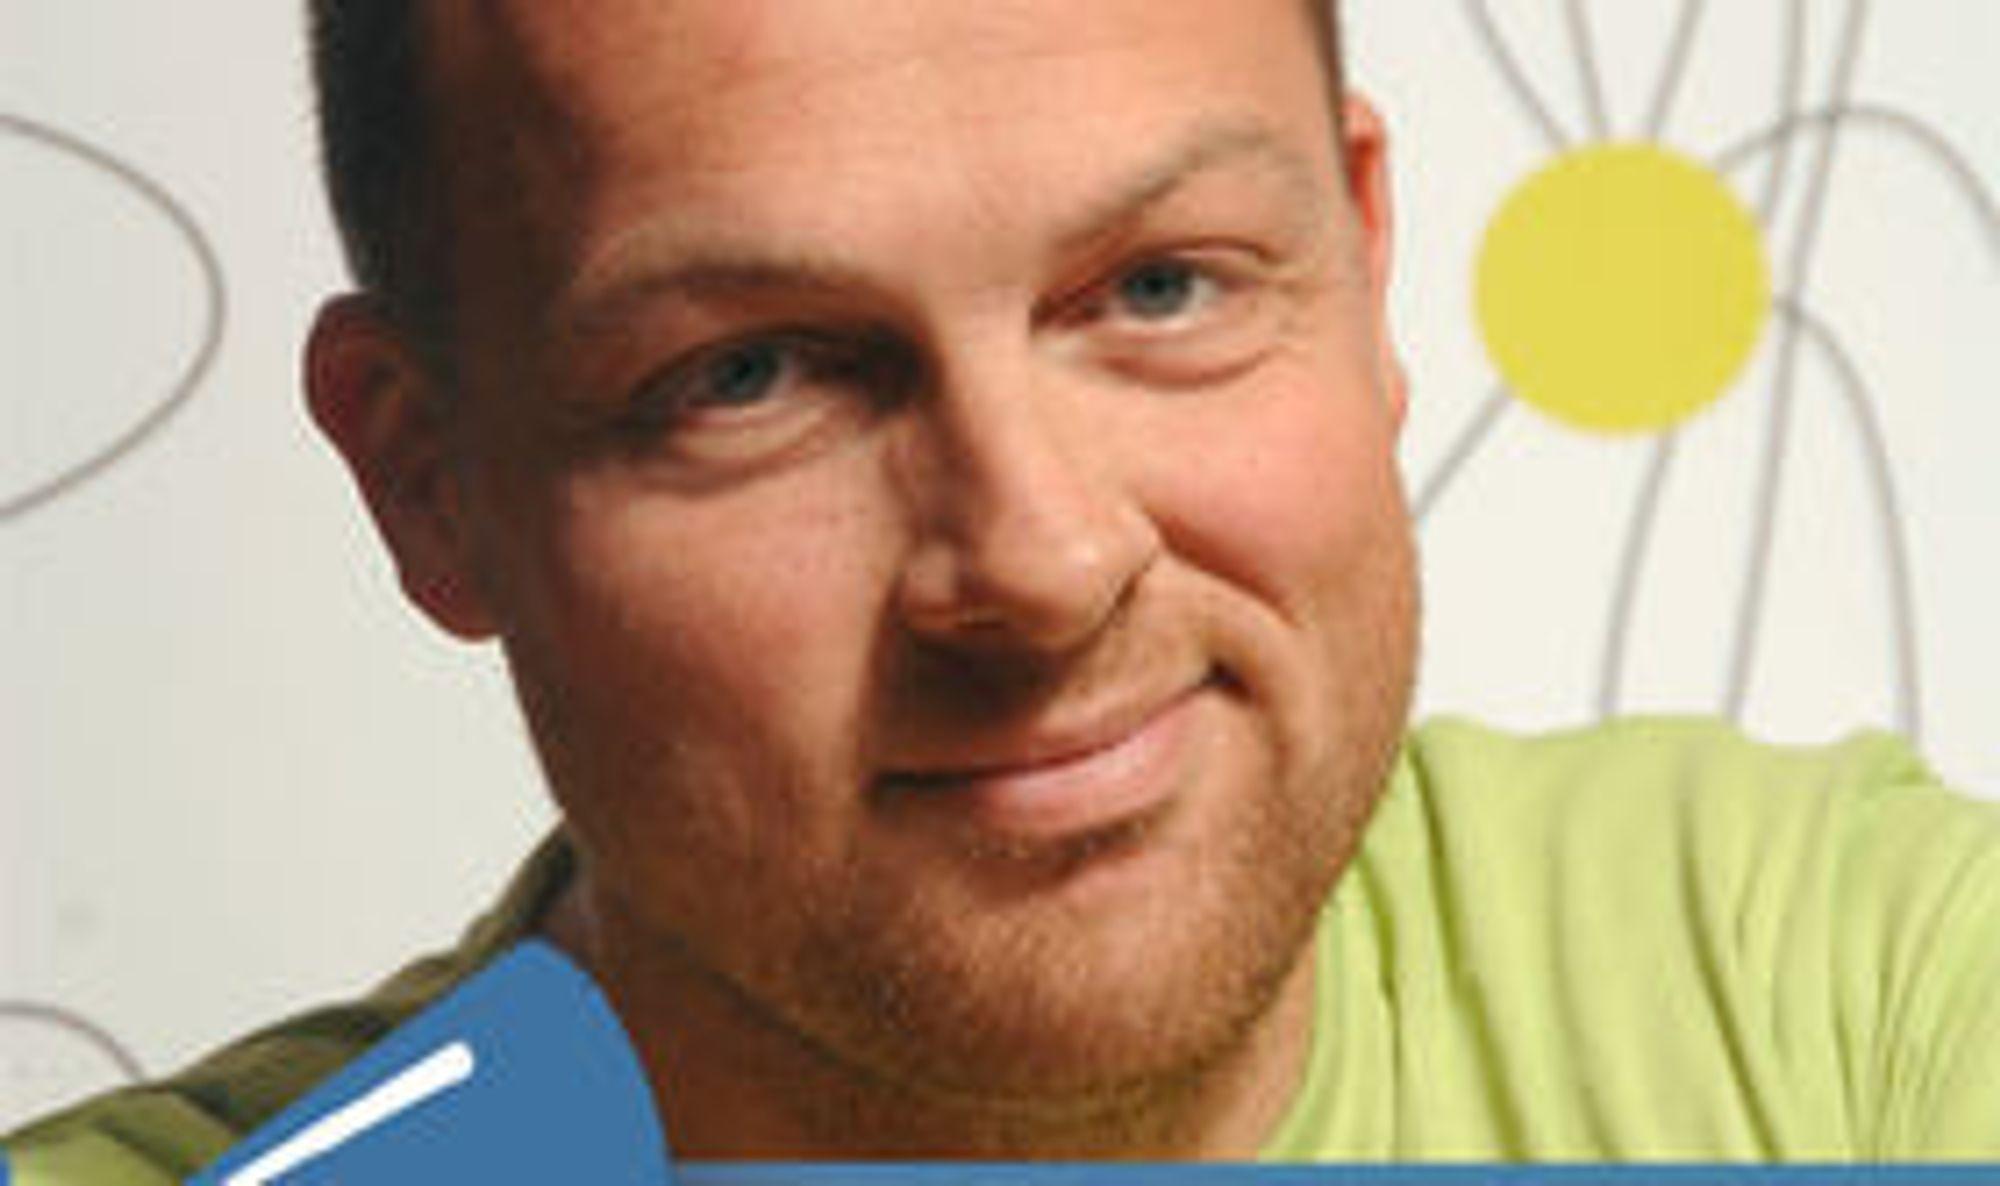 Christer Gundersen er seniorrådgiver, event-ansvarlig og kontakt for offentlig sektor i Friprogsenteret.